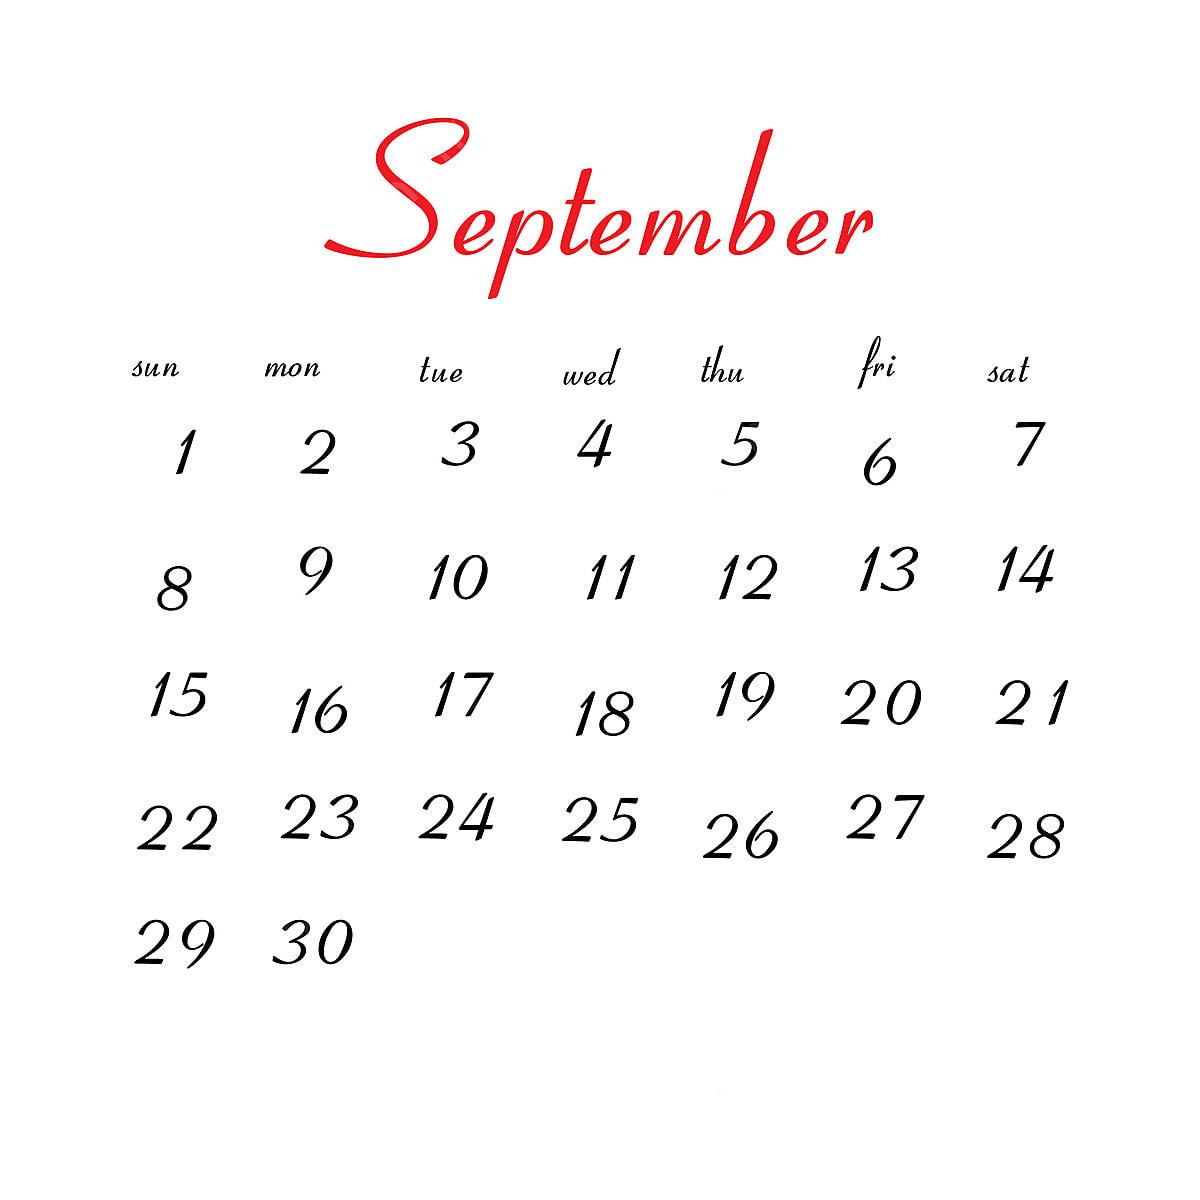 Calendario De Septiembre 2019 Para Imprimir Animado.Calendario De Septiembre De 2019 Calendario Vector Limpio